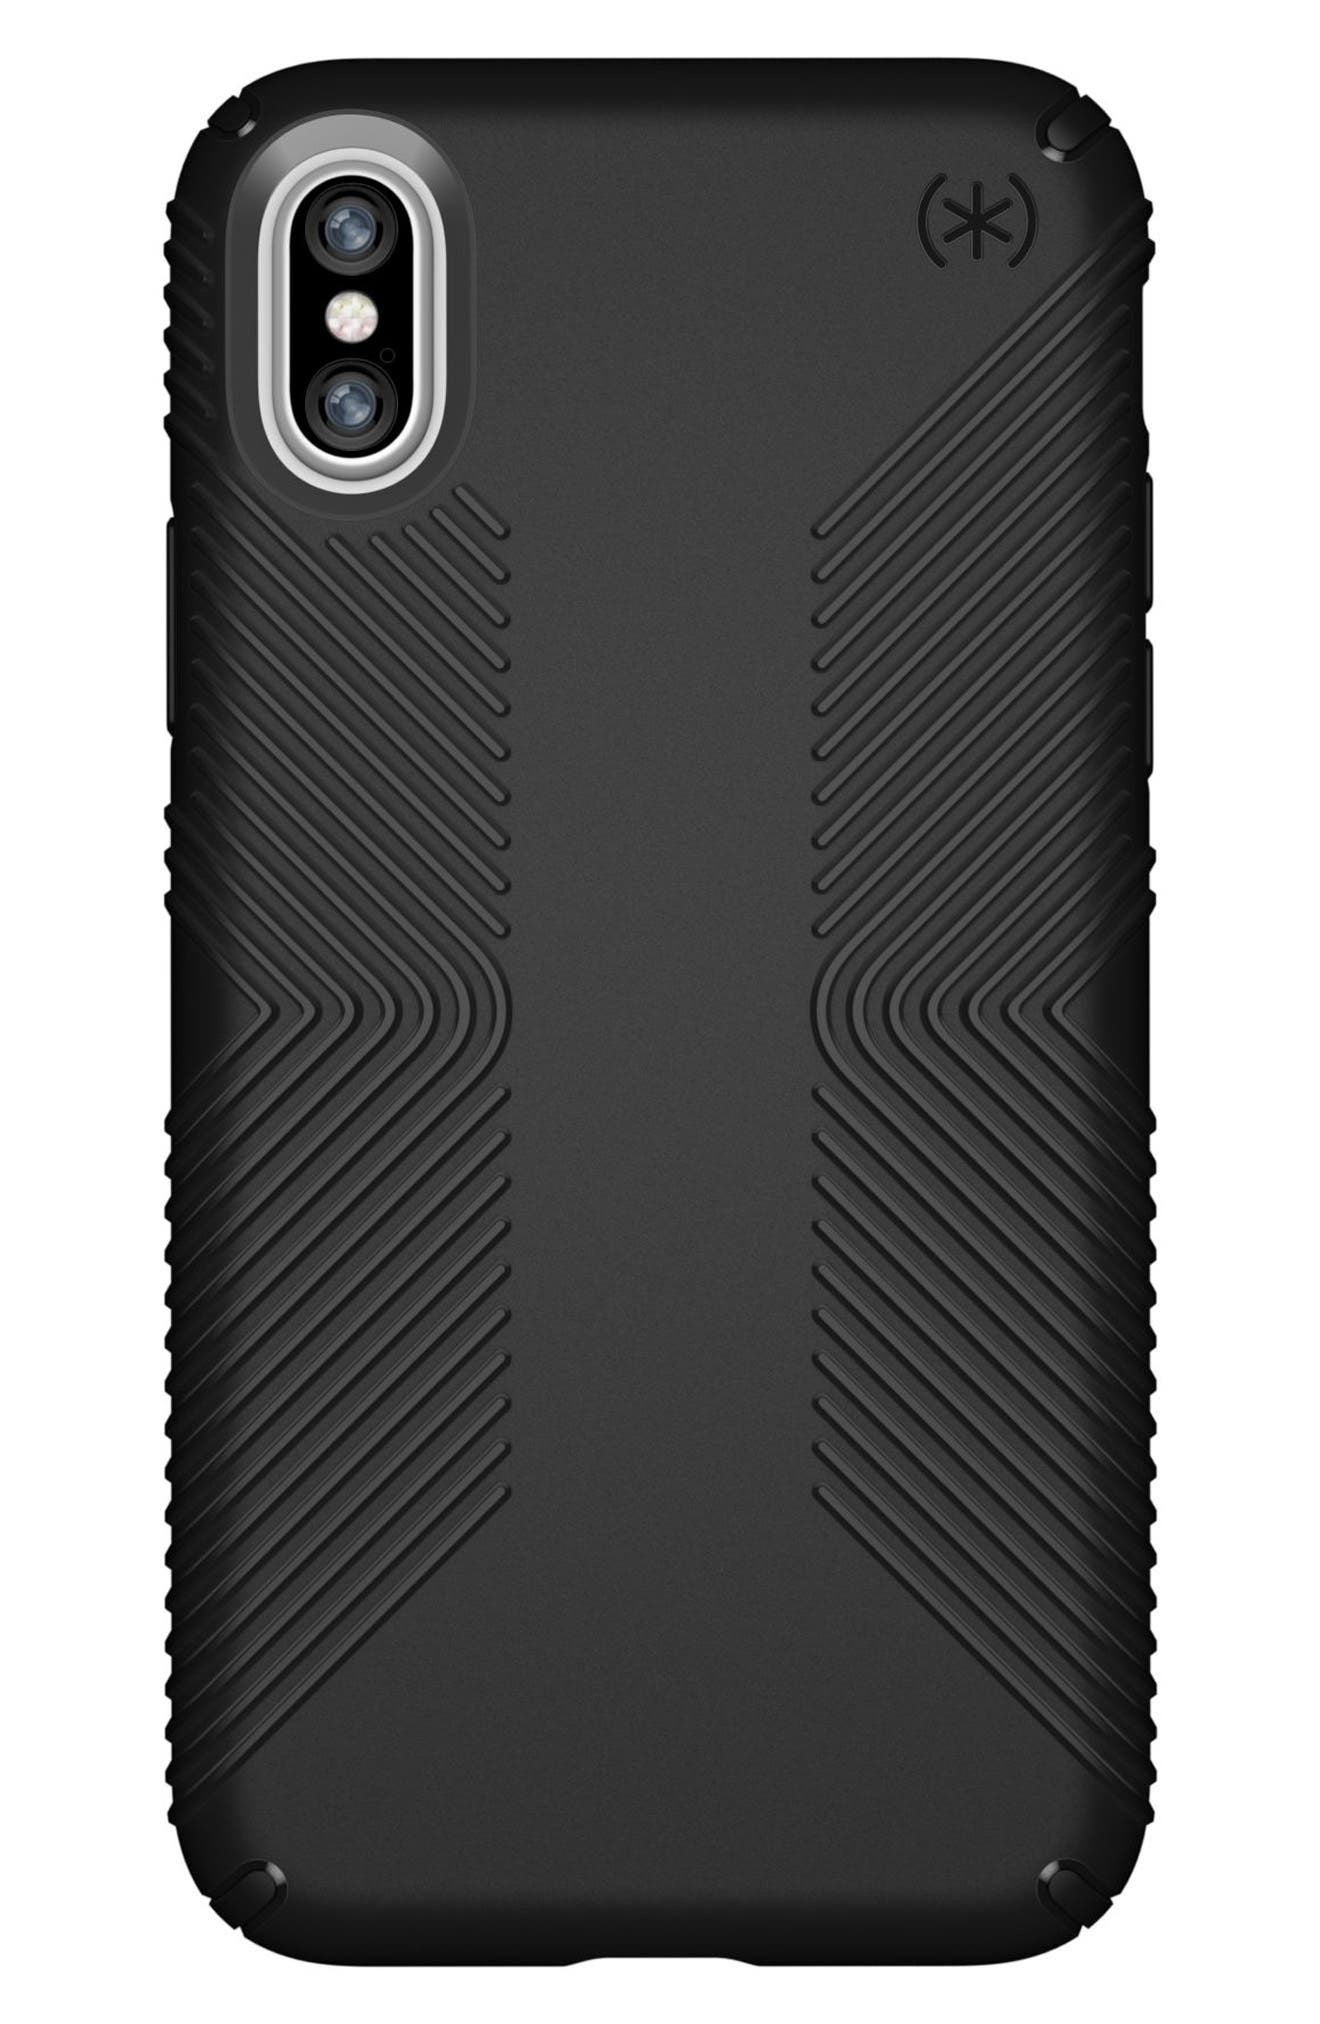 iPhone X Case,                         Main,                         color, Black/ Black